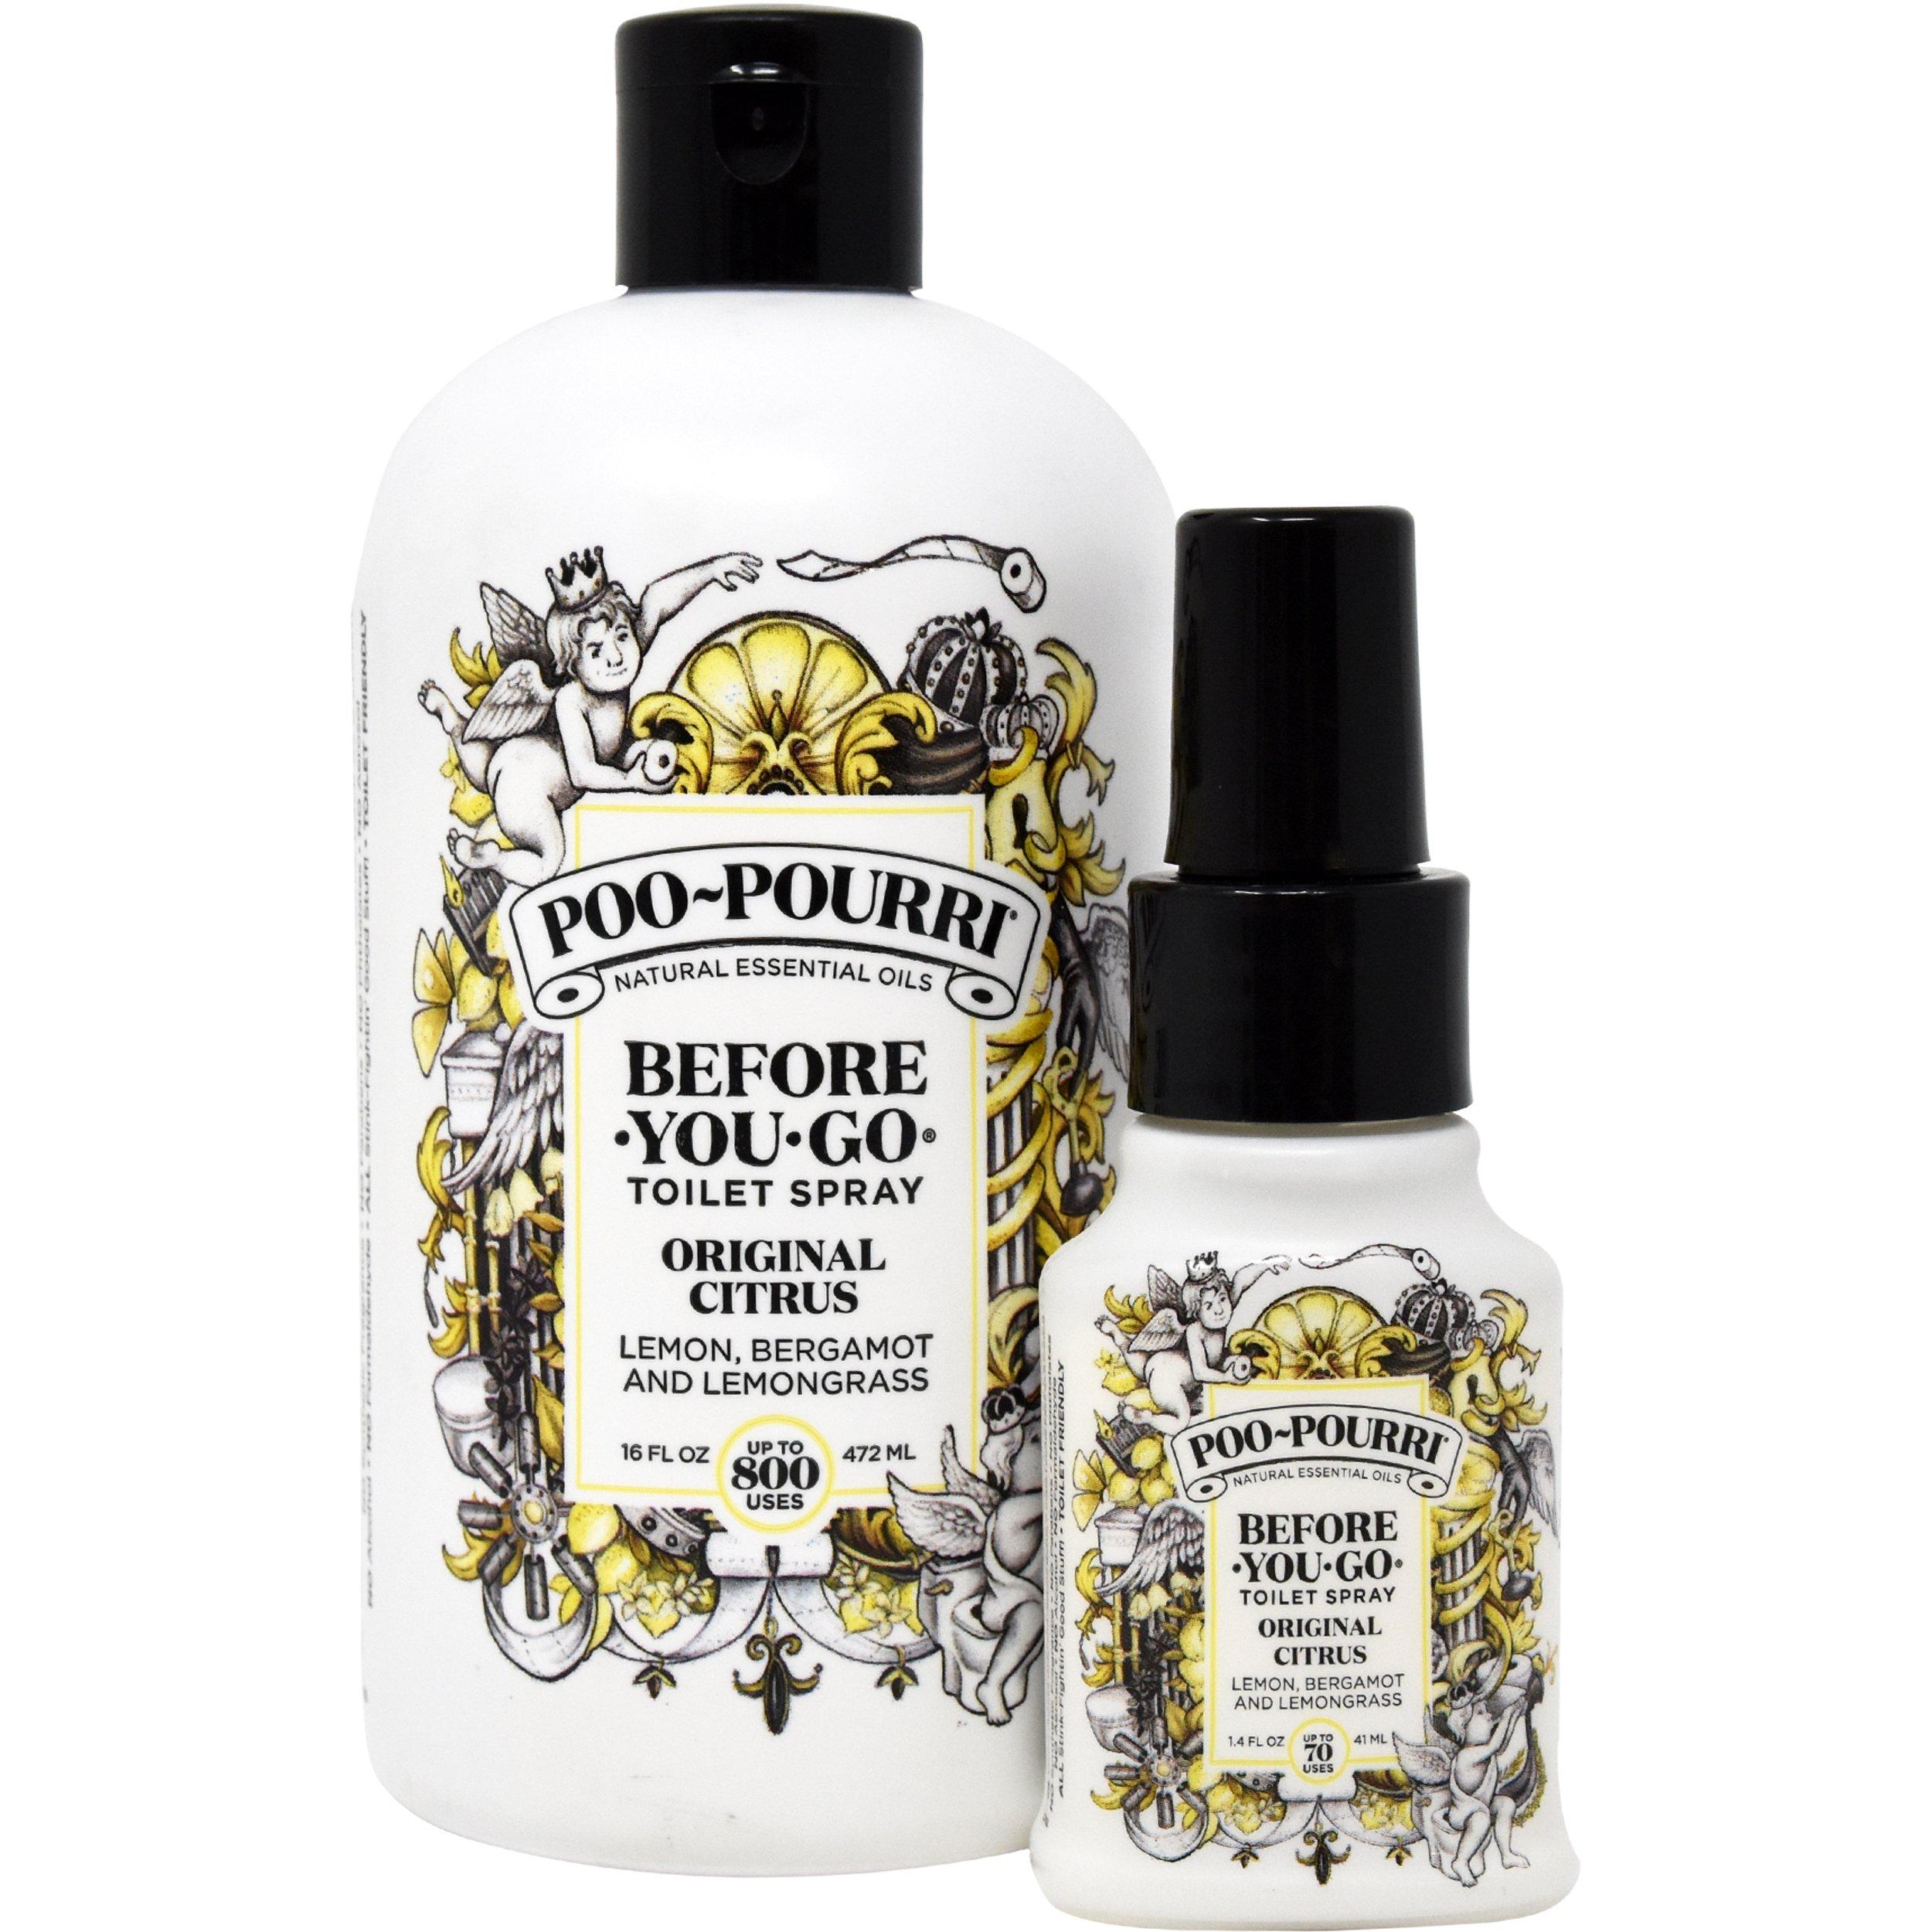 Poo Pourri Original 16-Ounce Refill Bottle and 1.4-Ounce Original